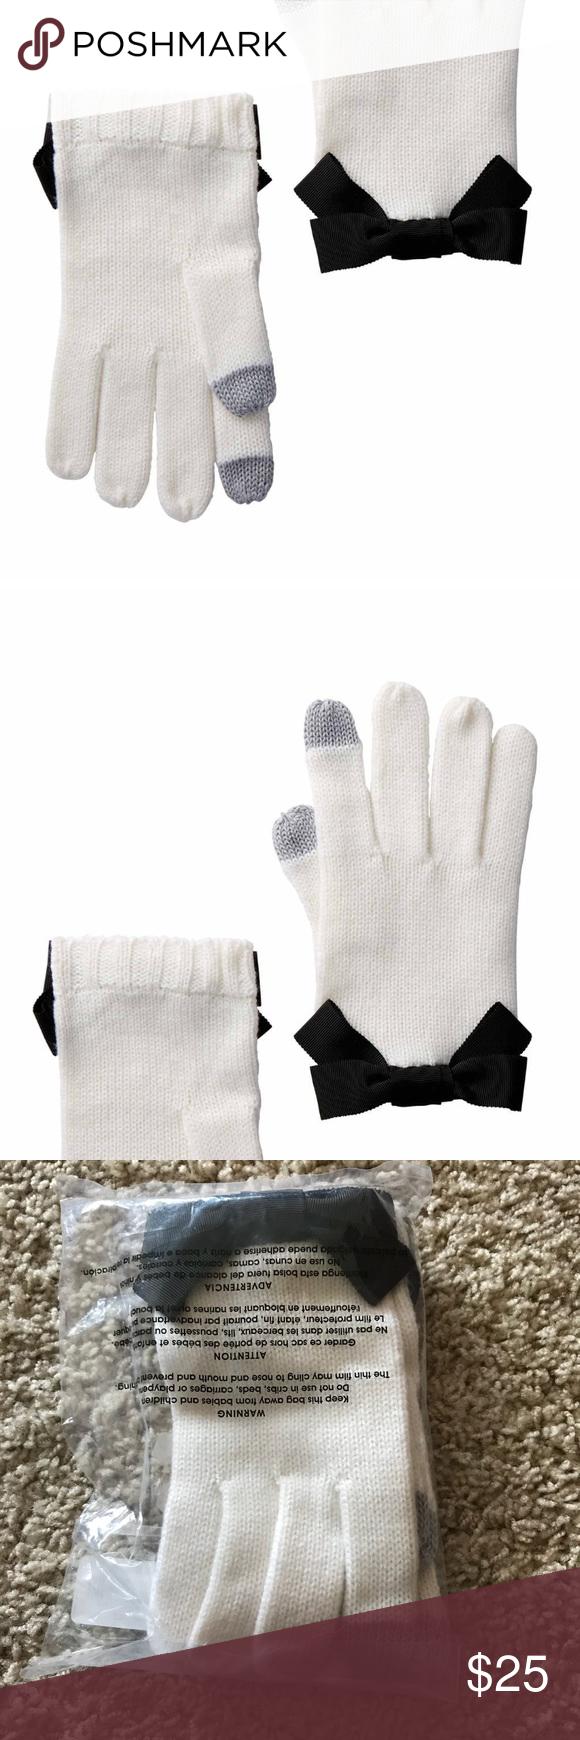 Kate Spade Grosgrain Bow Glove O S Clothes Design Fashion Design Fashion